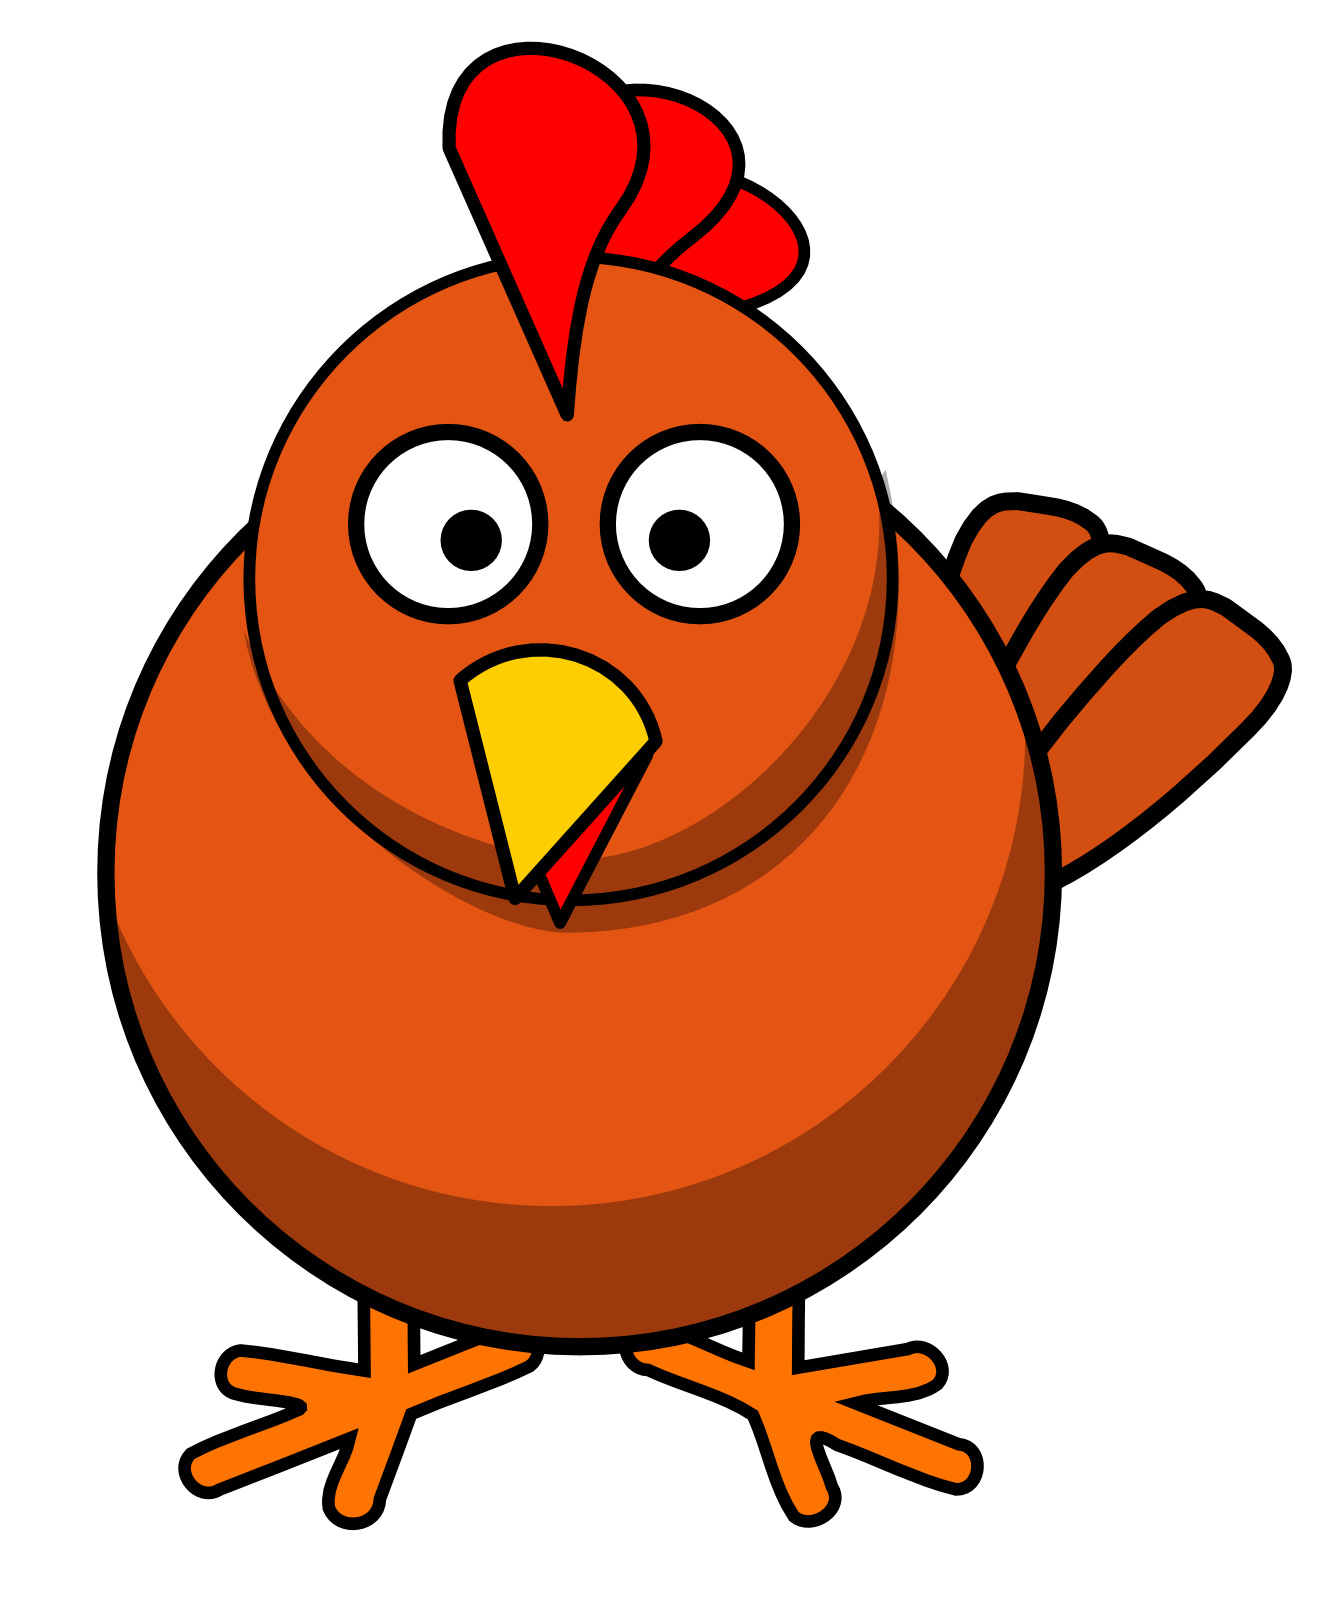 Chicken Clip Art - Chickens Clipart